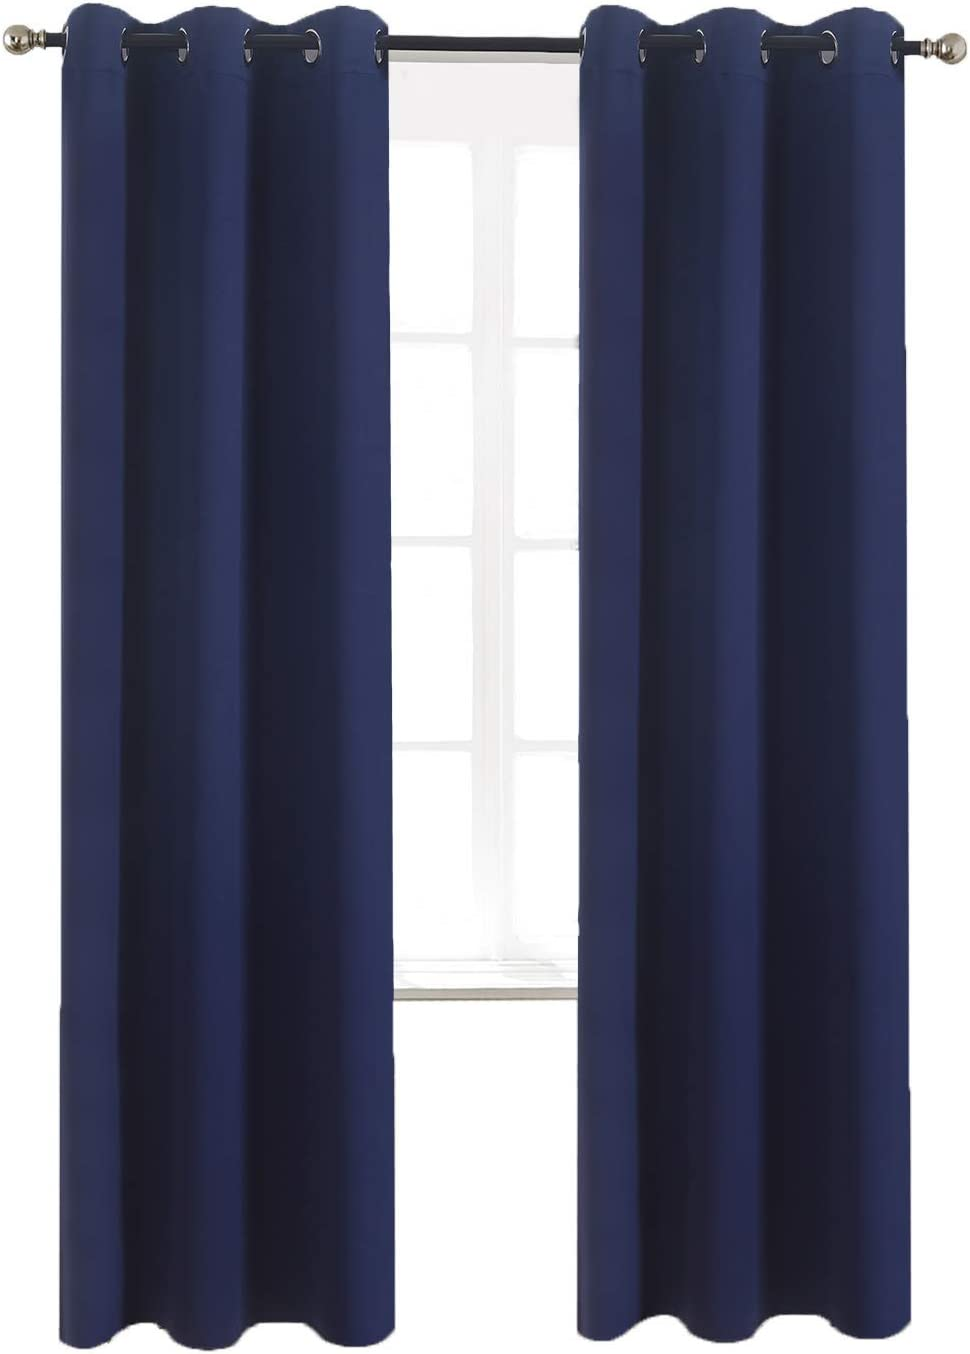 Blockout Curtain Drape Sheer Eyelet Blue Pink Kids Bedroom Grommet Window Fabric